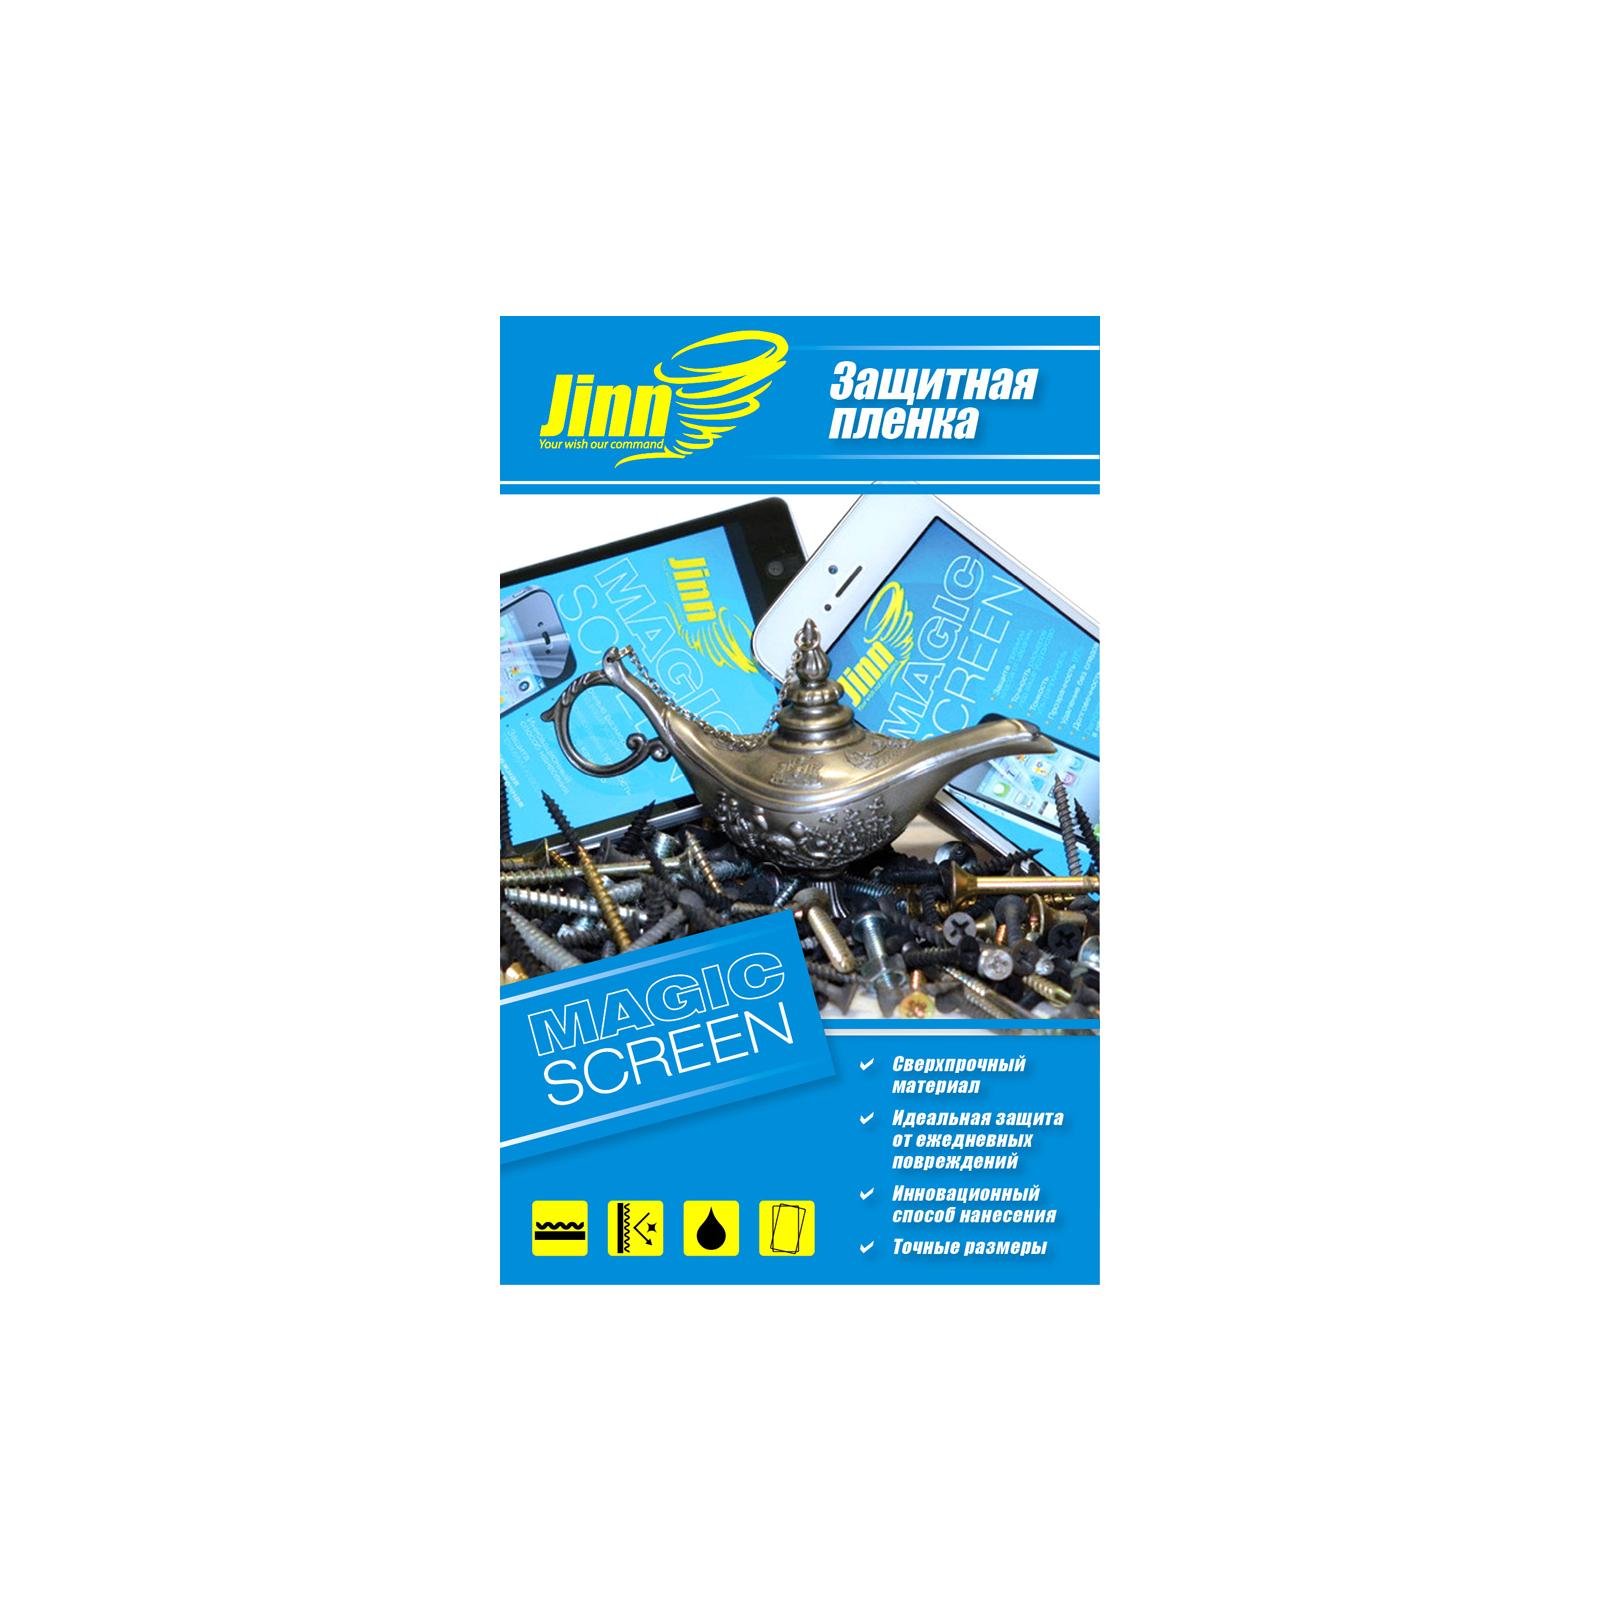 "Пленка защитная JINN ультрапрочная Magic Screen для Samsung Galaxy Mega 5.8"" i915 (Samsung Galaxy Mega 5.8"" front+back)"